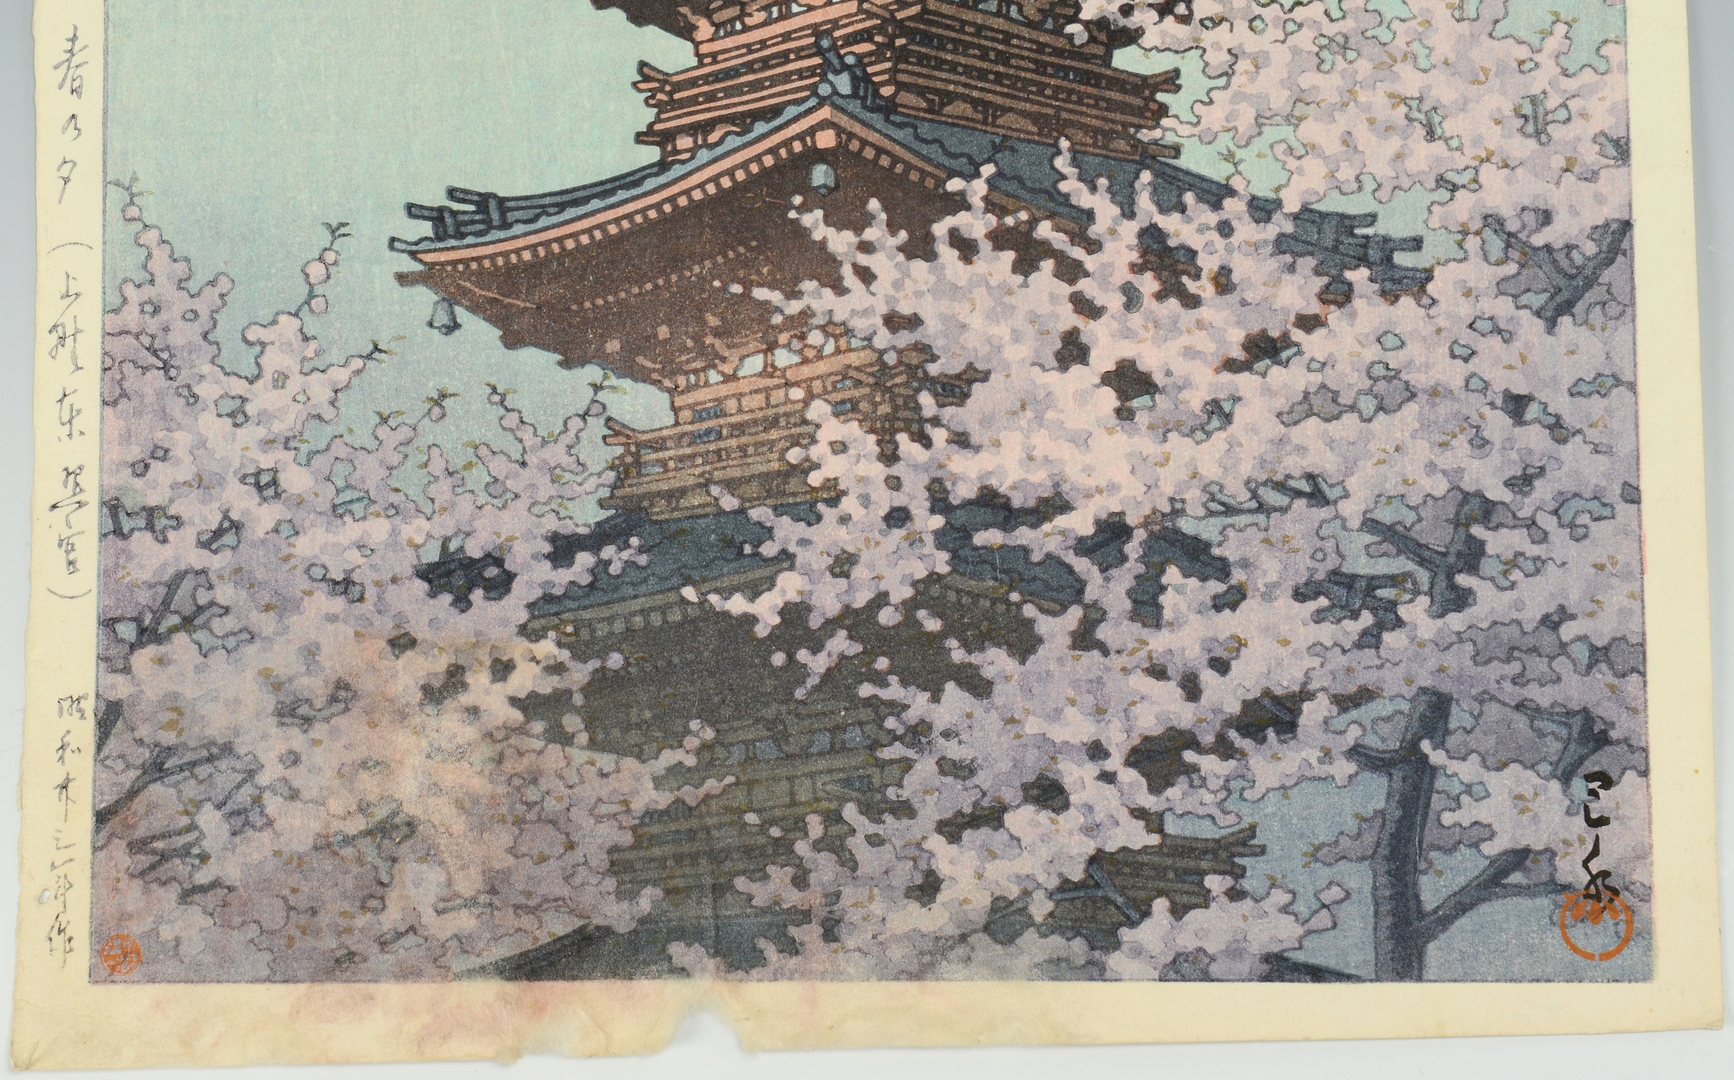 Lot 3088151: Three Japanese Woodblock Prints